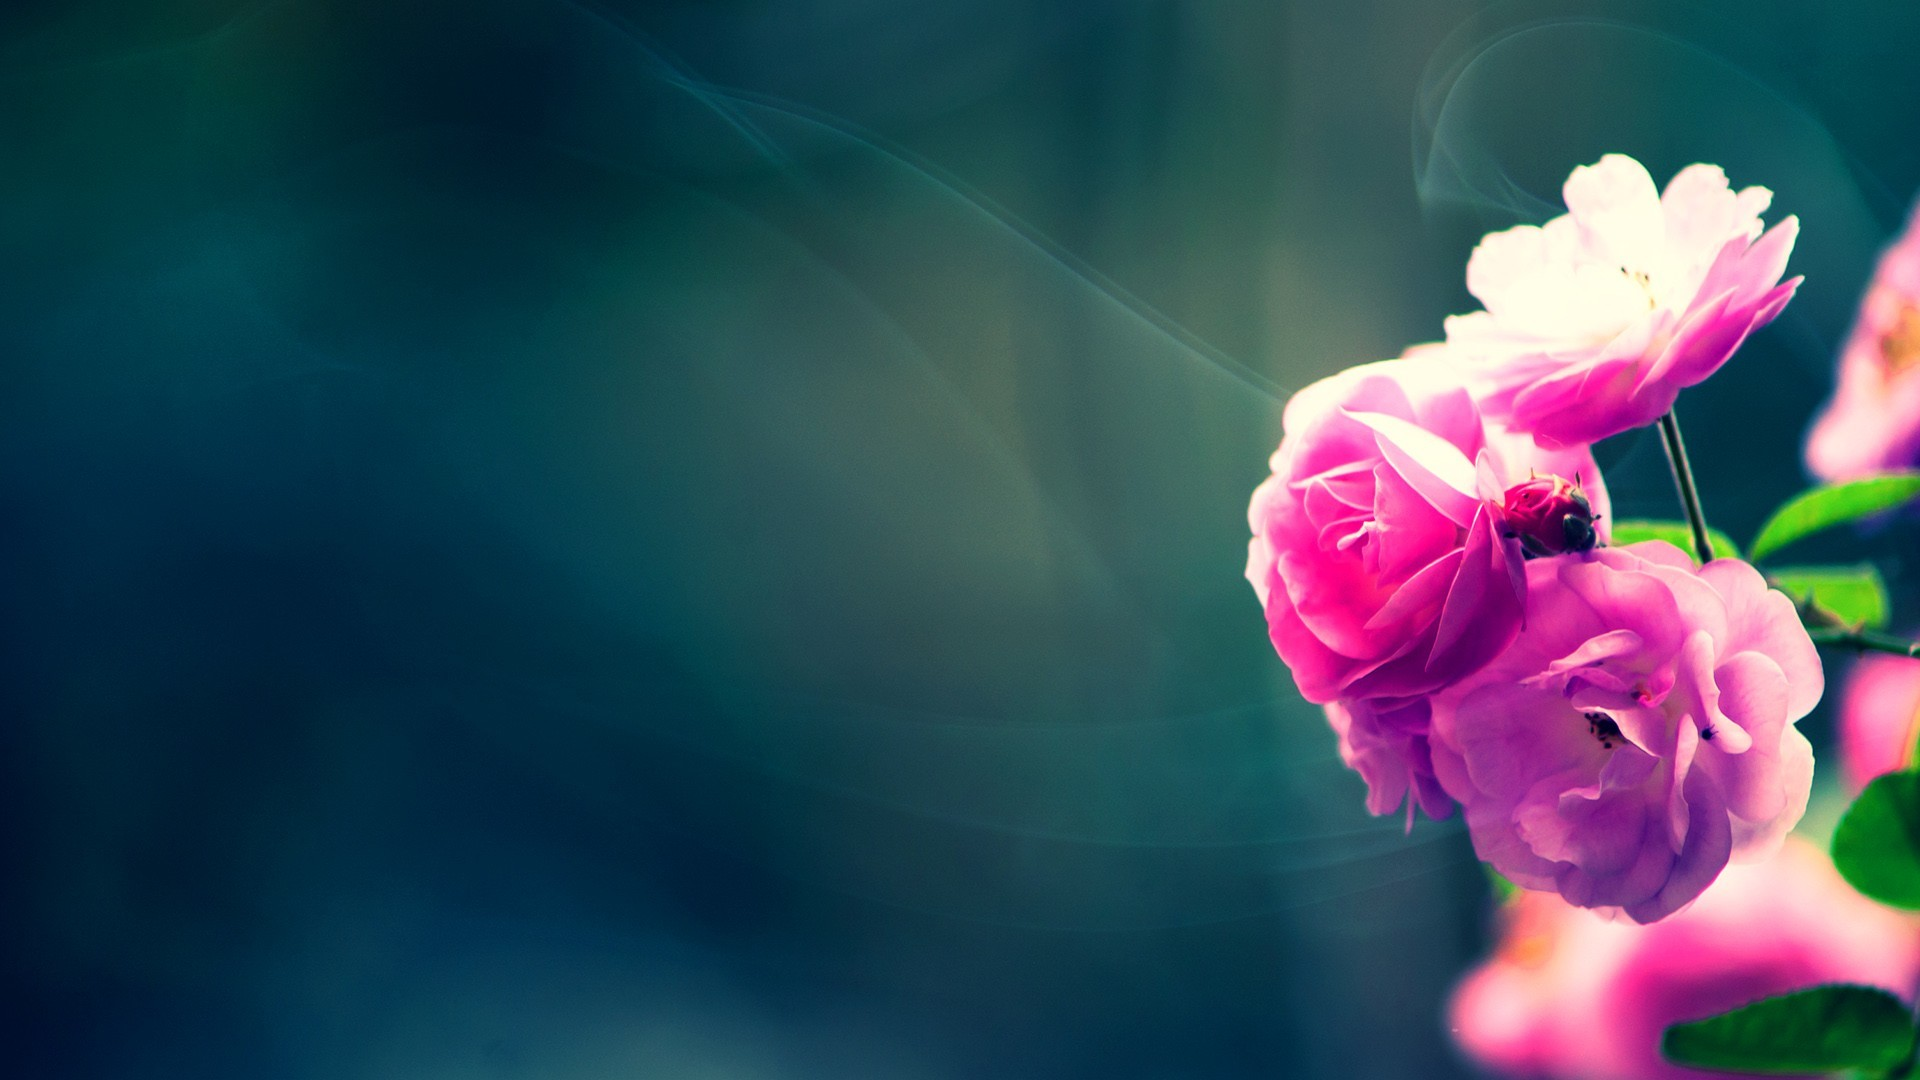 1920x1080 Flower Wallpaper Widescreen Pic12fc Background